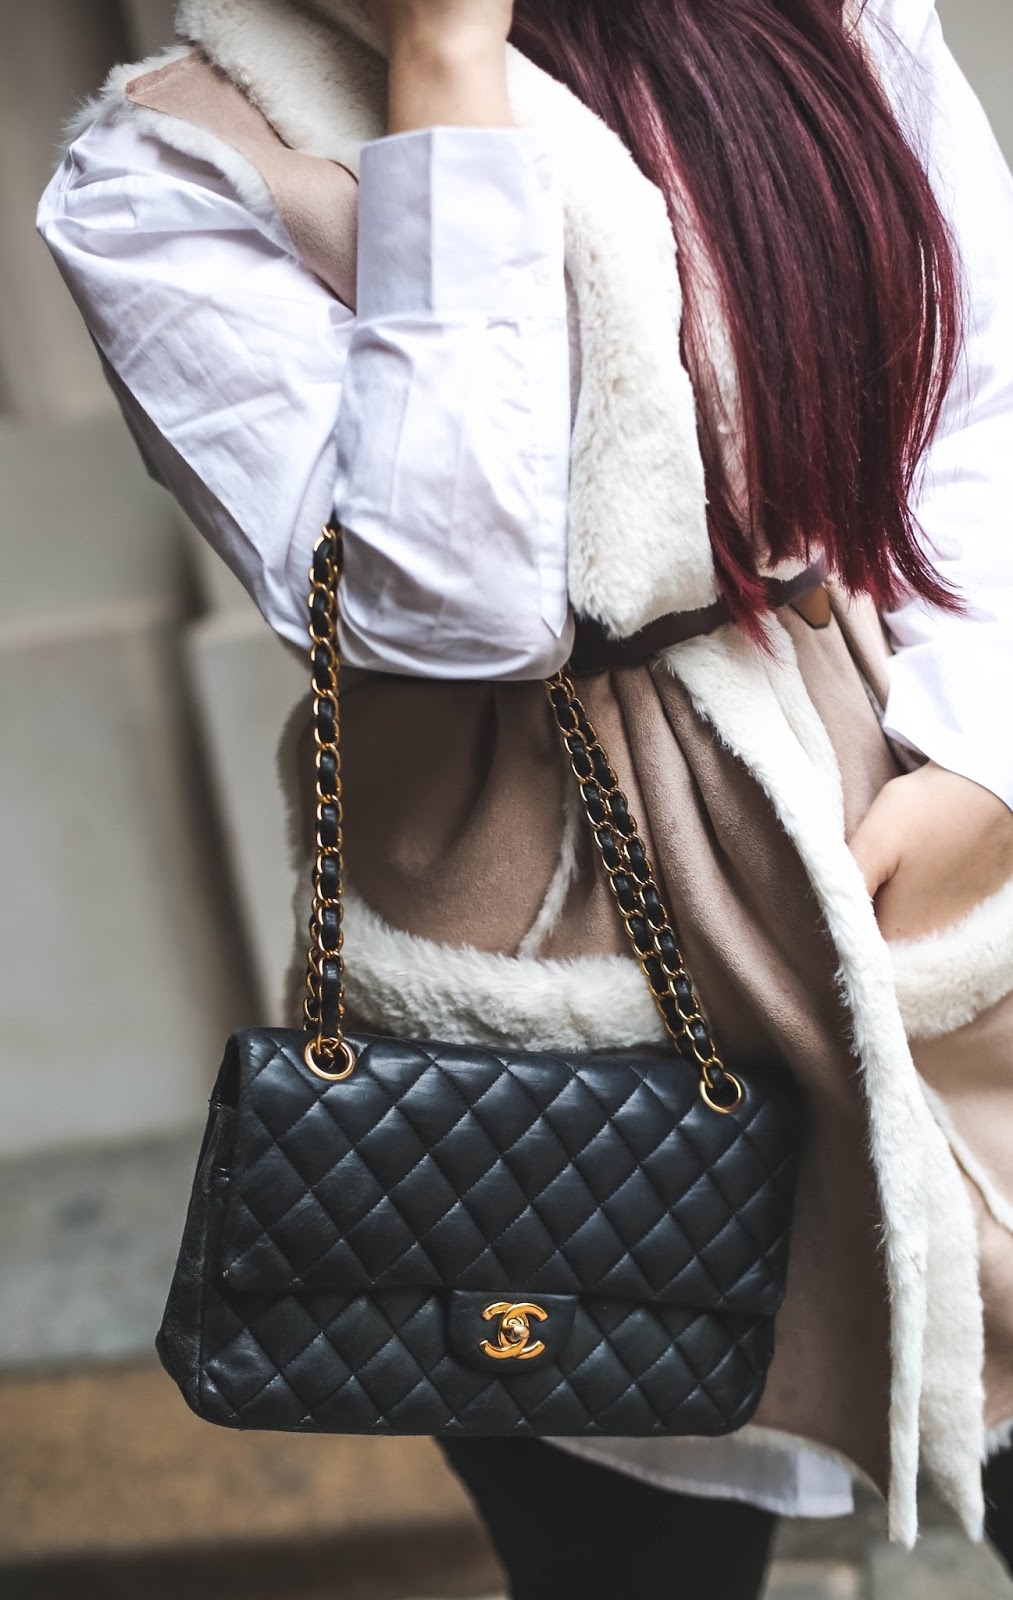 timeless sac Chanel blog mode paris